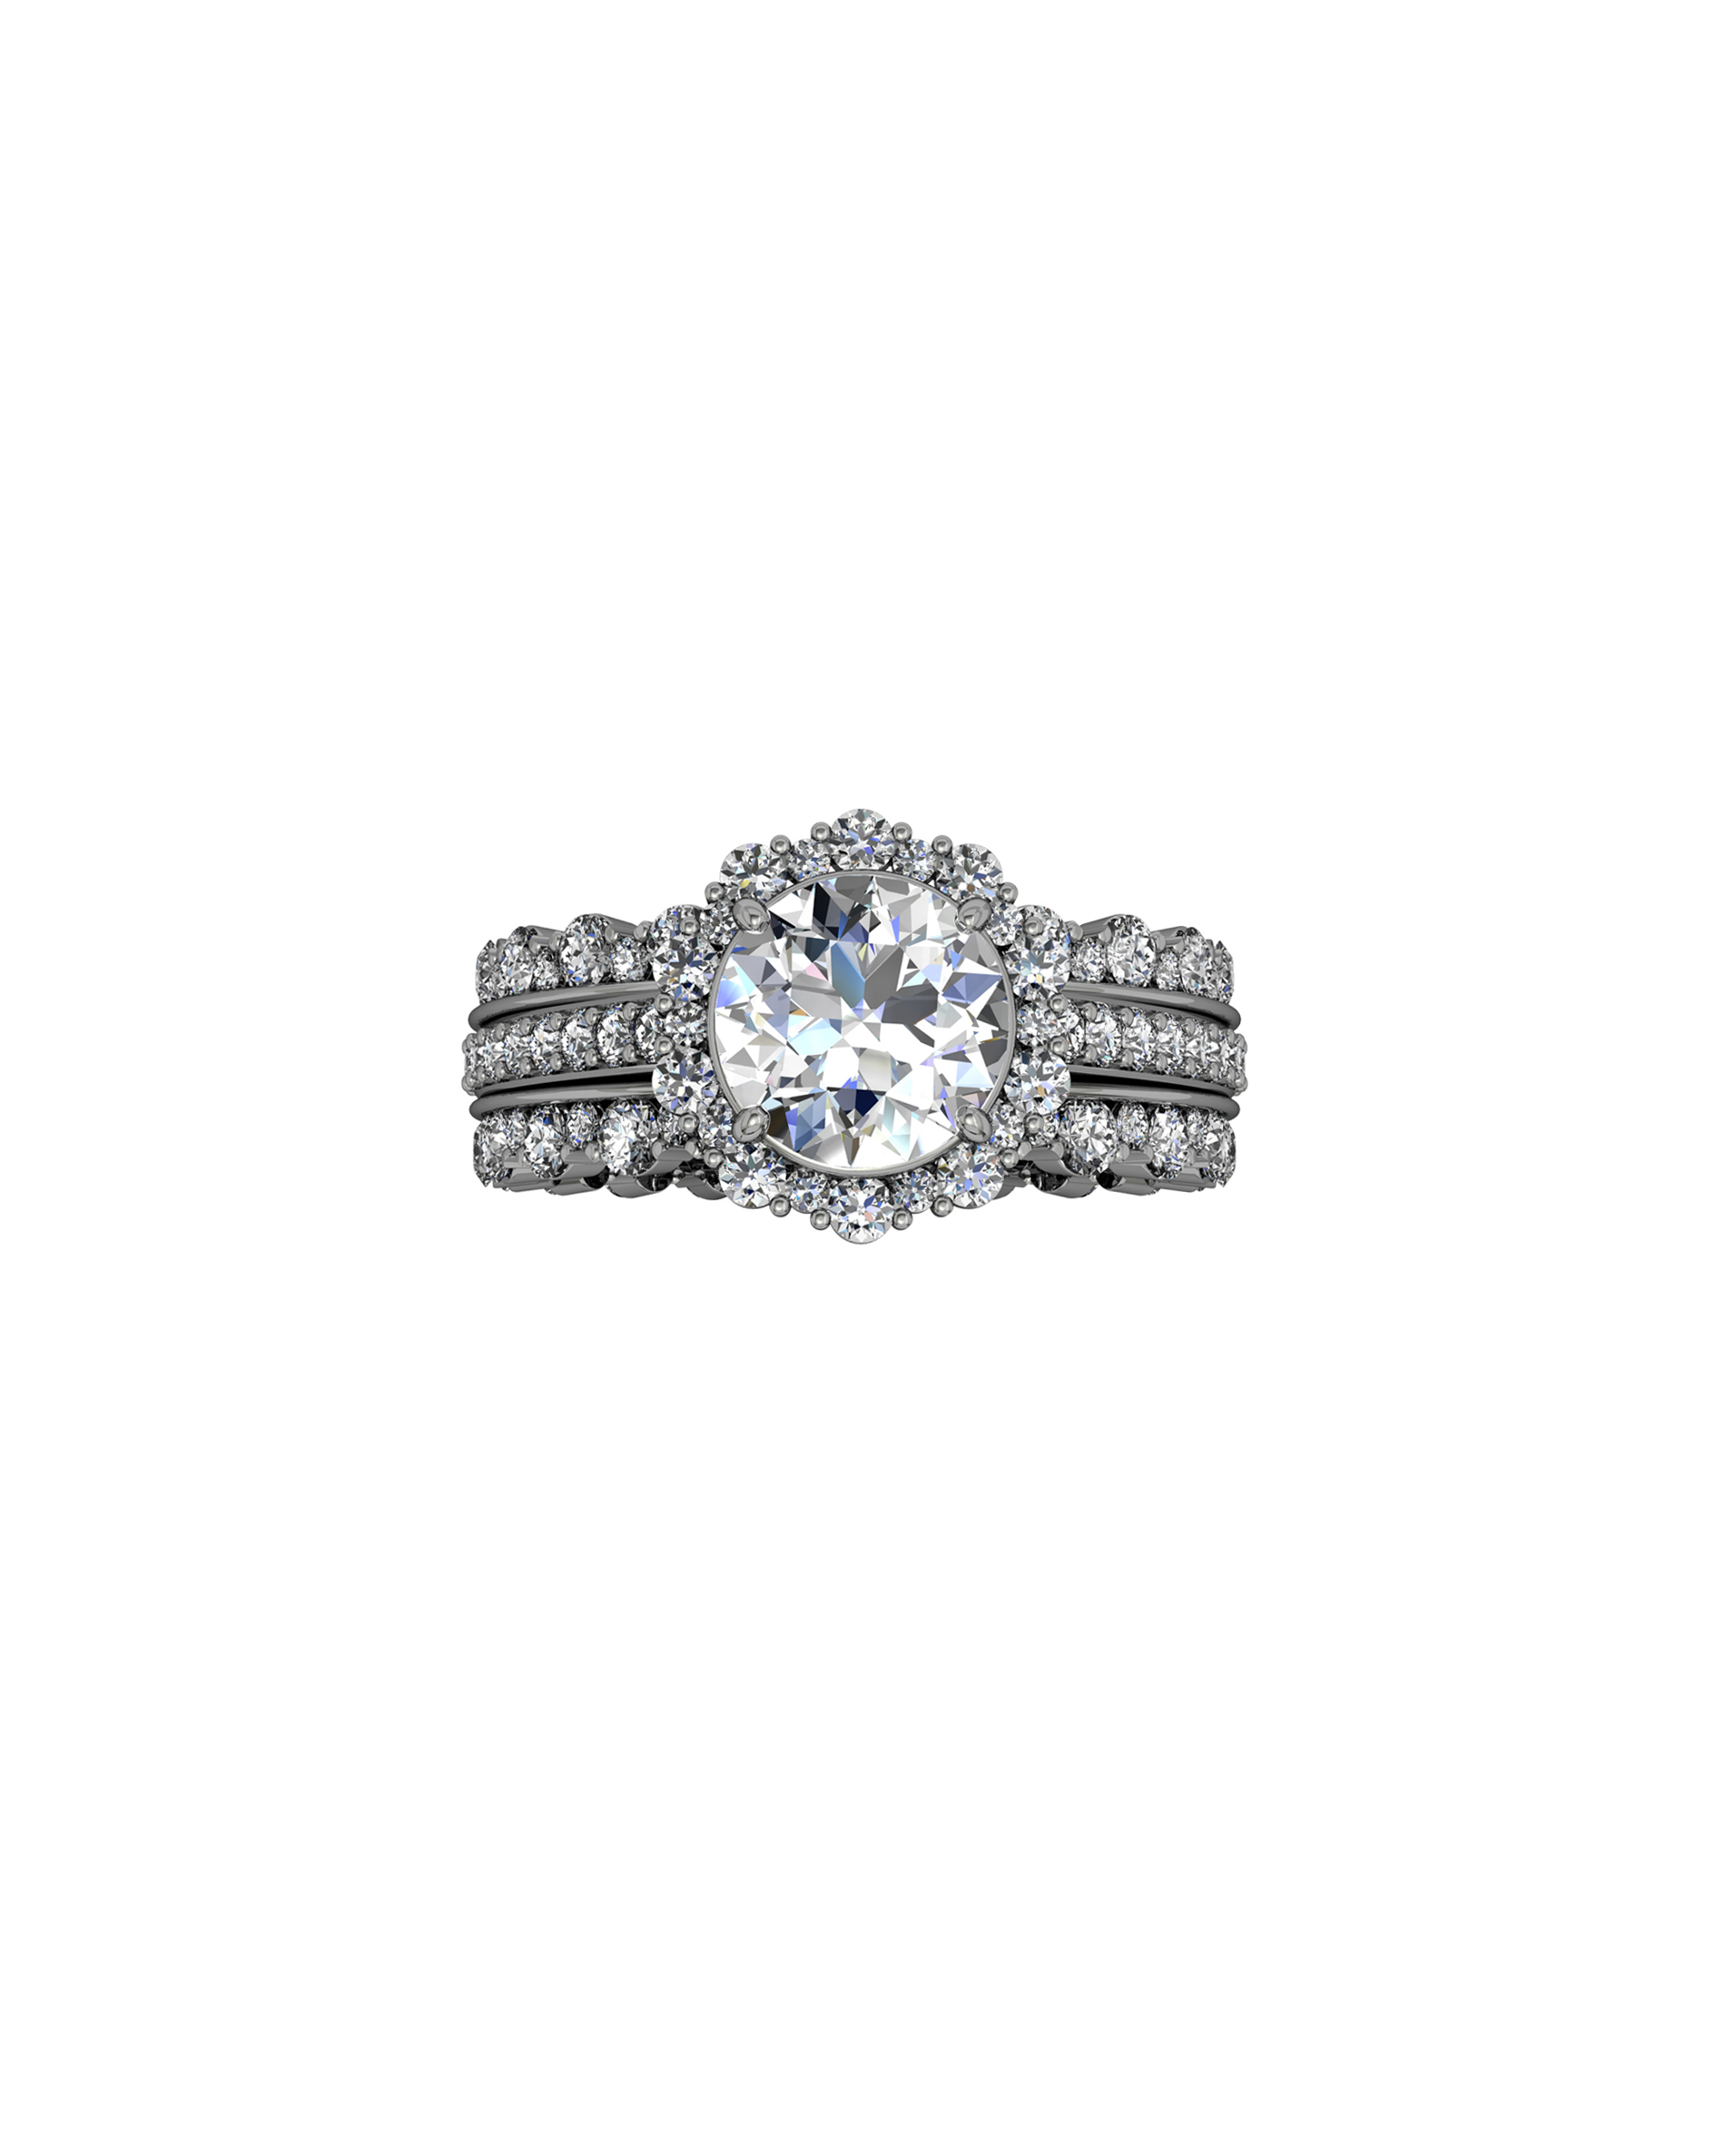 designer diamond bridal jewelry-2.jpg